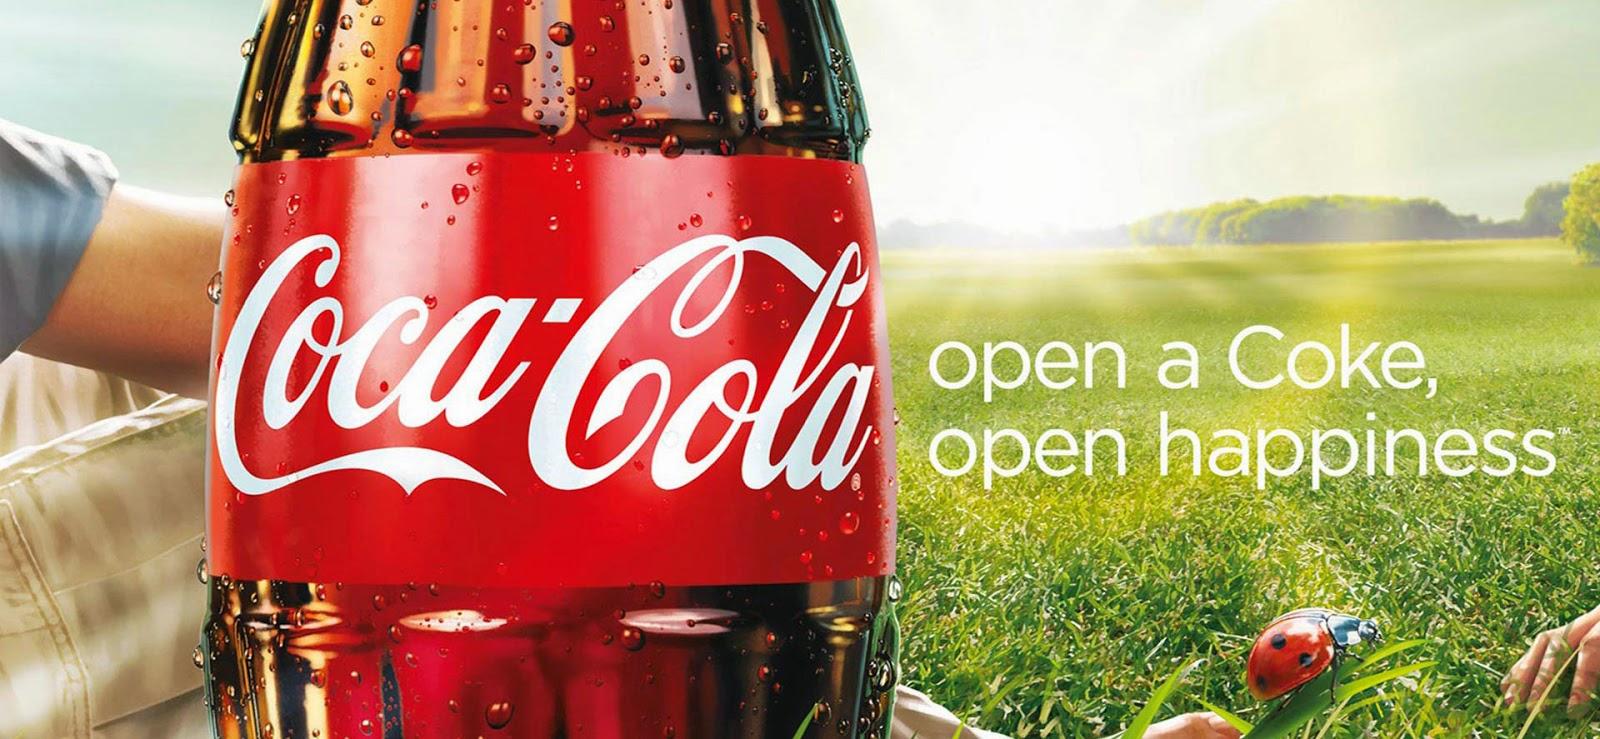 Coca-Cola-open-happiness1